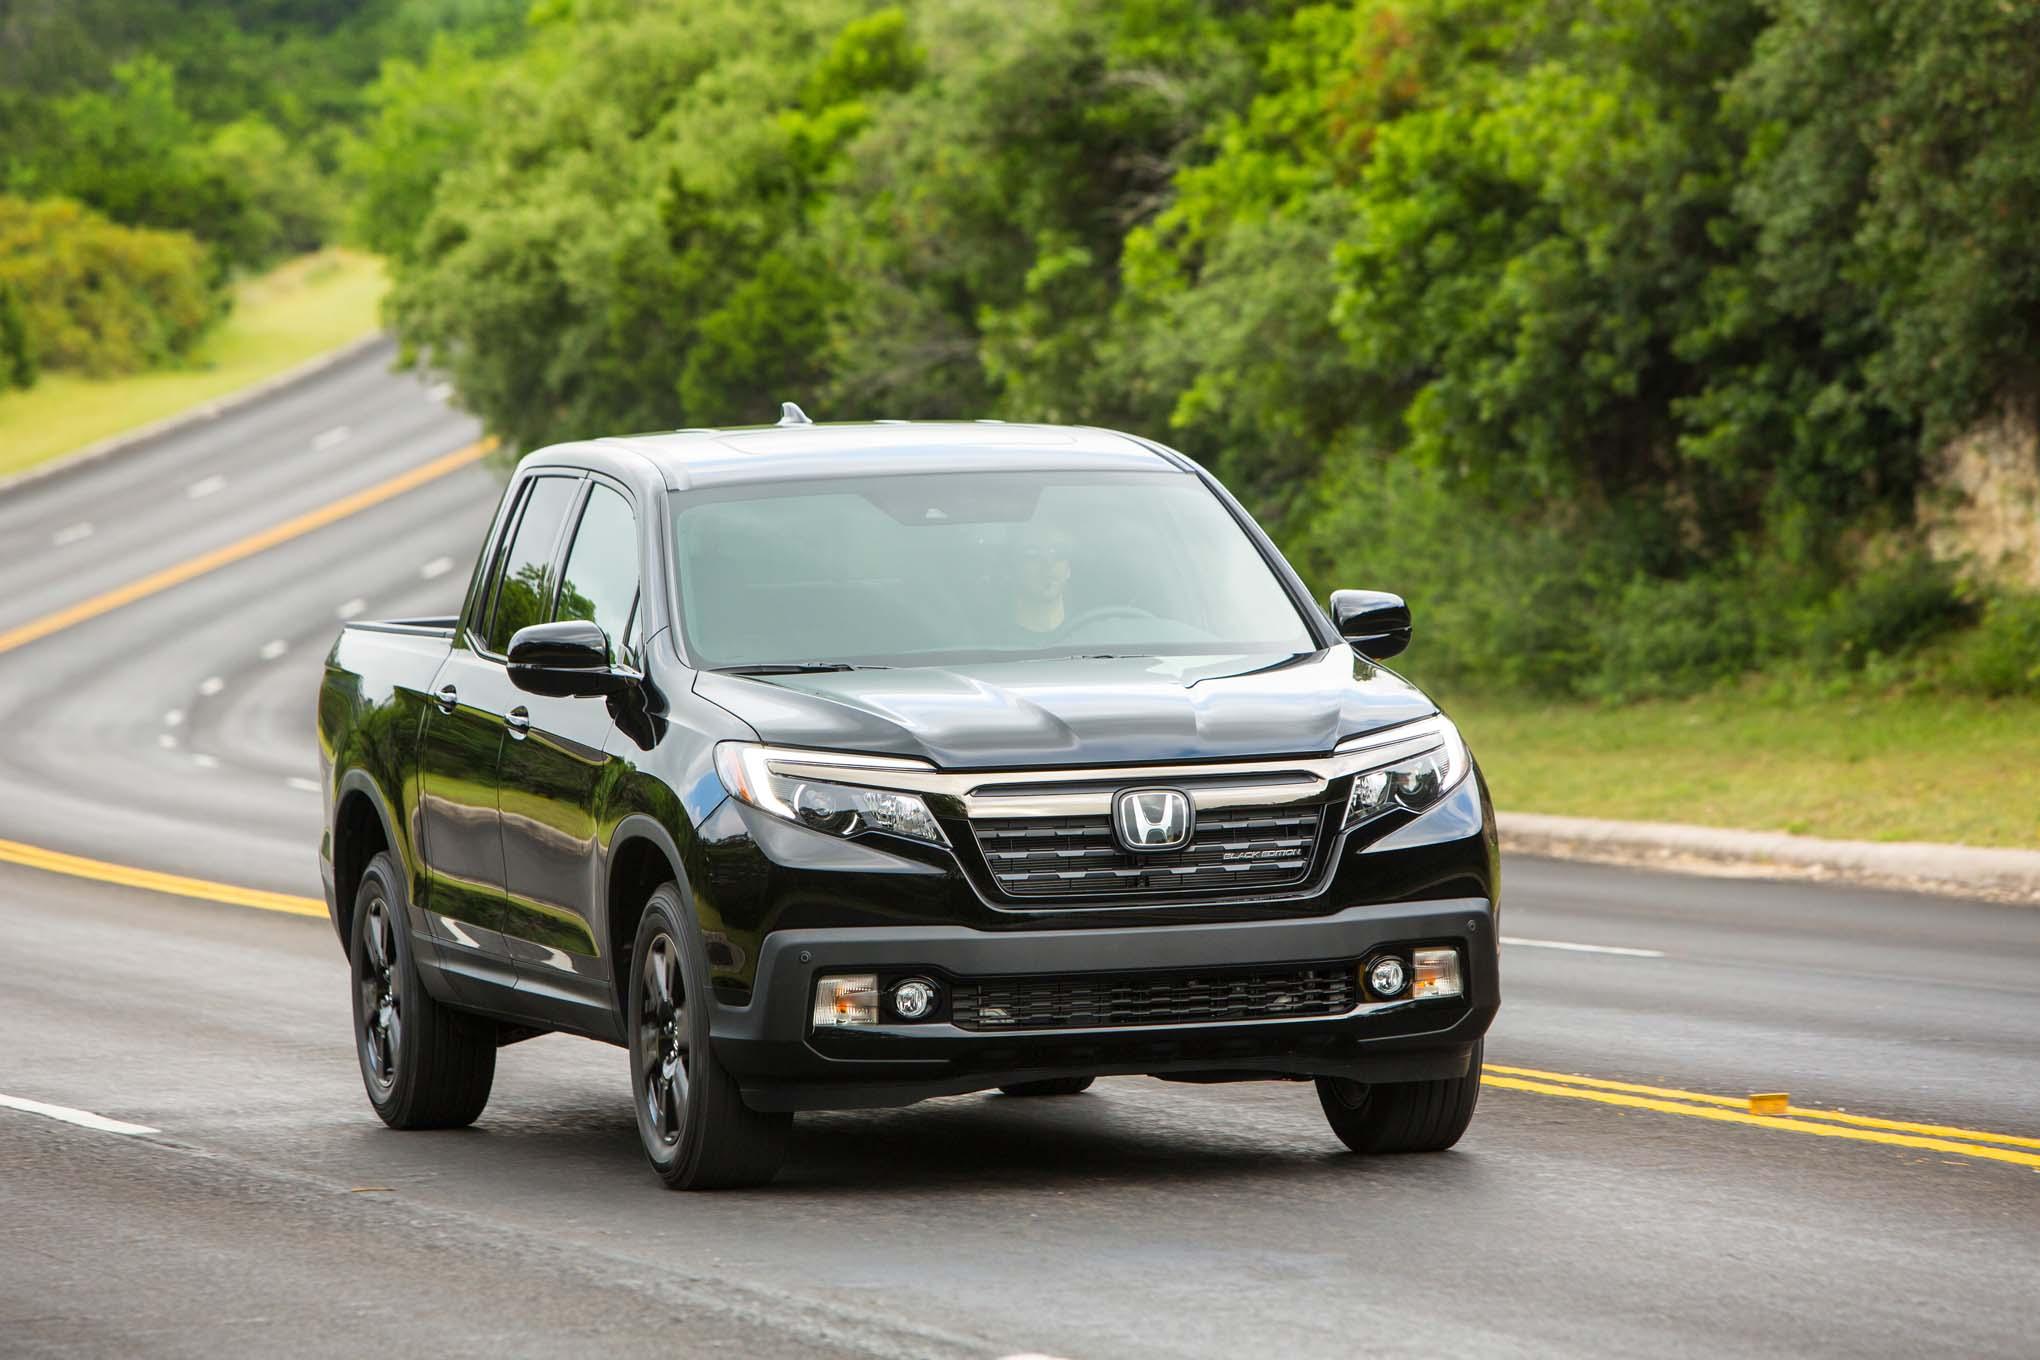 2017 Honda Ridgeline Awd Black Edition Review Gearopen